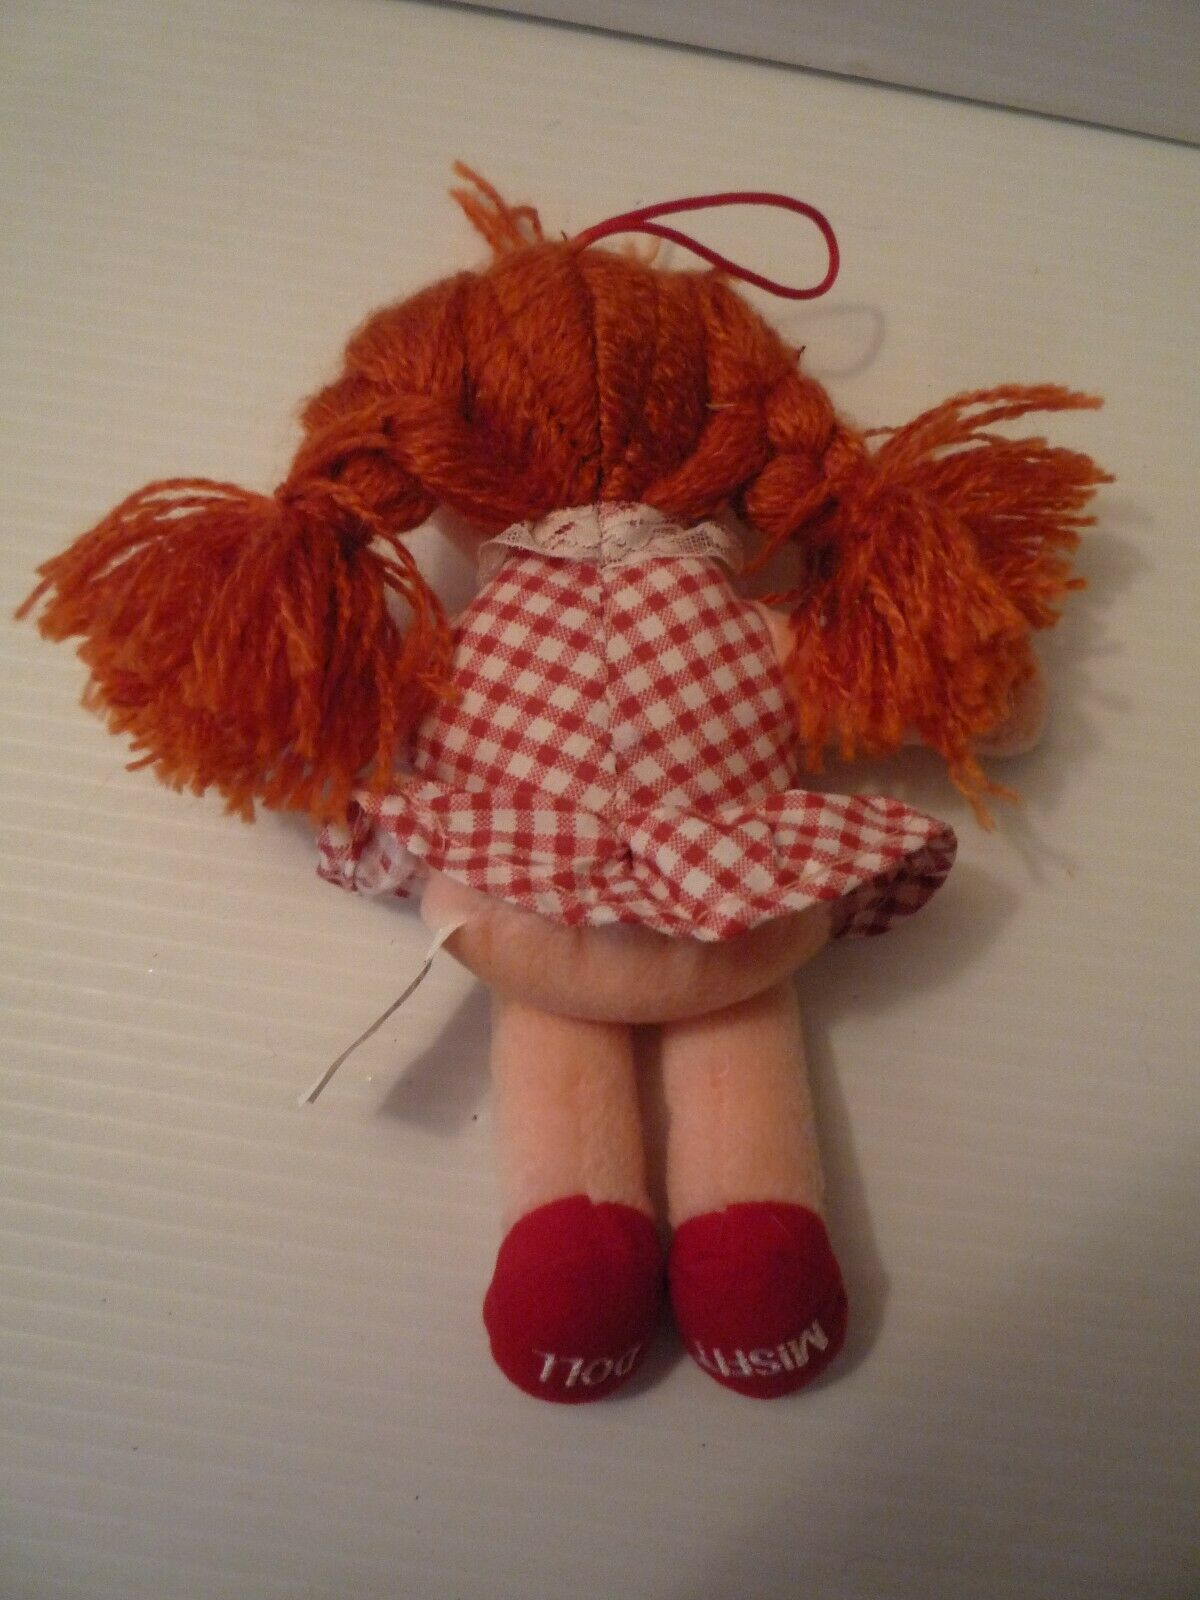 "Rudolph Misfit Toys, Rag Doll, Plush Bean 9""  Rudolph Company 2000"